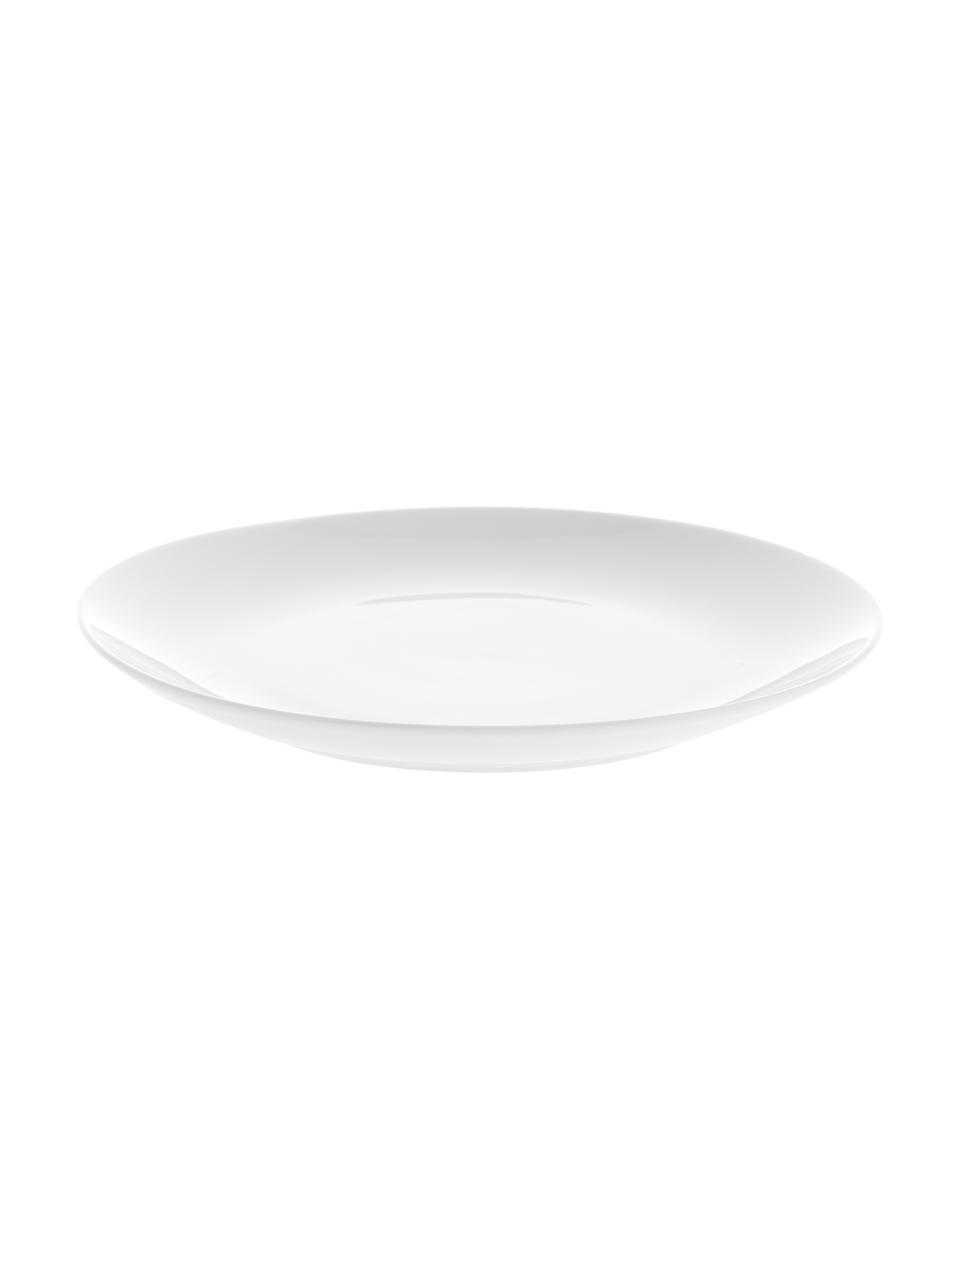 Porzellan-Frühstücksteller Delight Modern in Weiß, 2 Stück, Porzellan, Weiß, Ø 20 cm